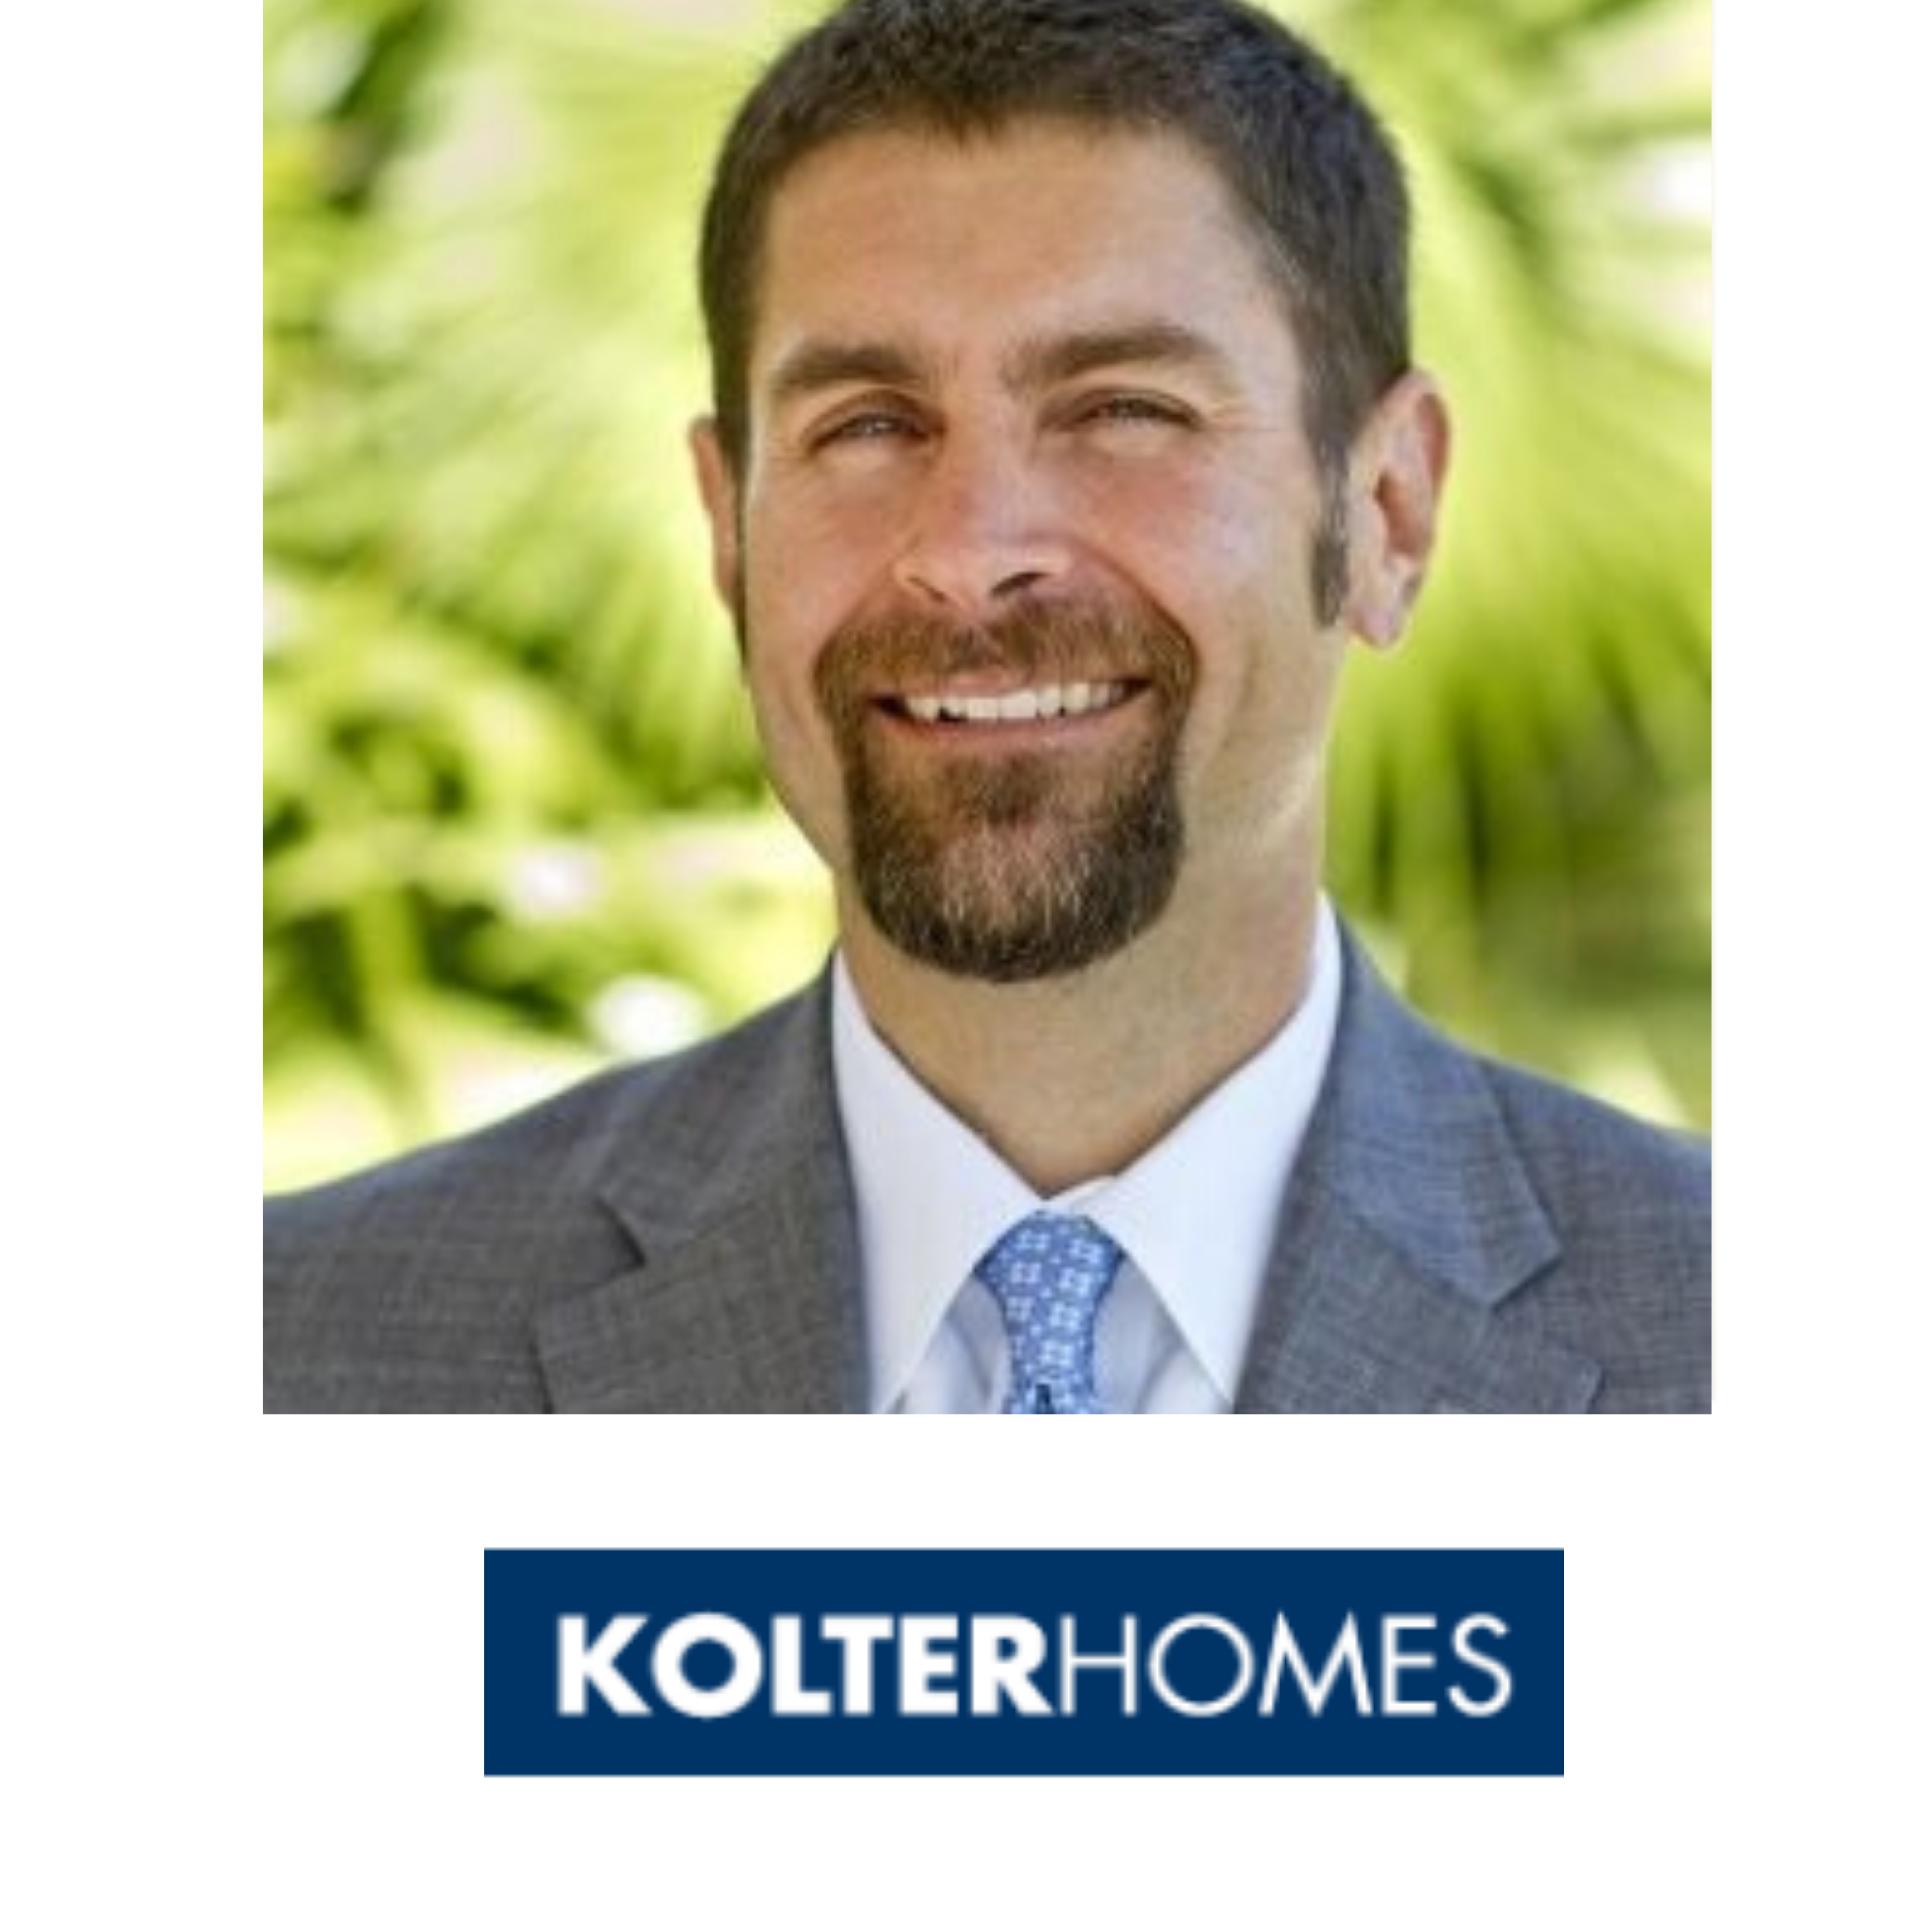 Kolter Homes - John Manrique